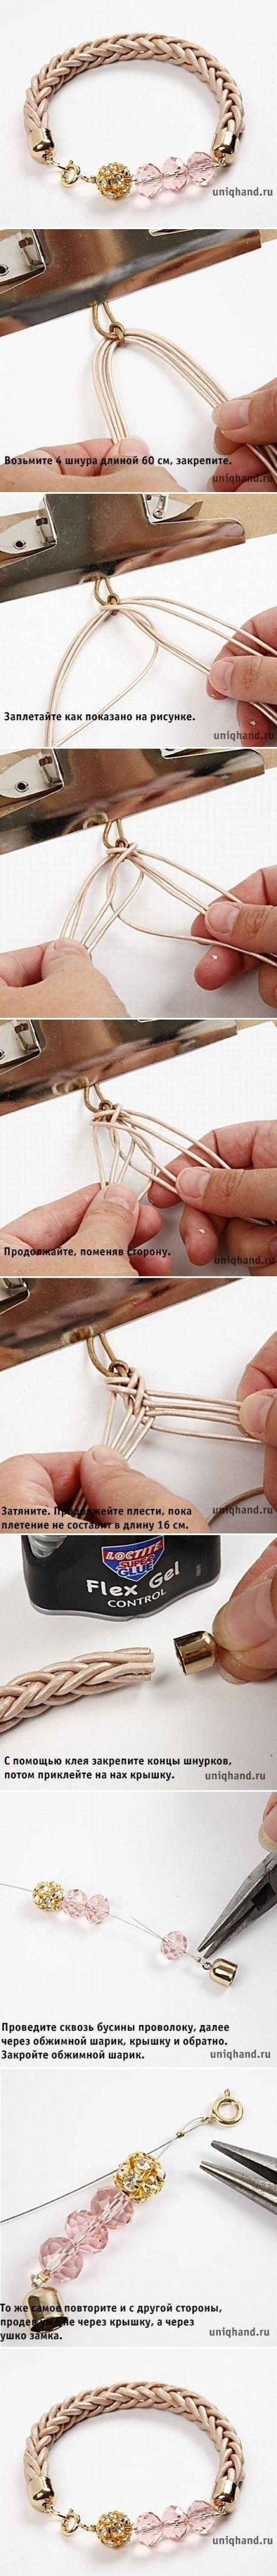 DIY Easy Simple Leather Bracelet DIY Easy Simple Leather Bracelet